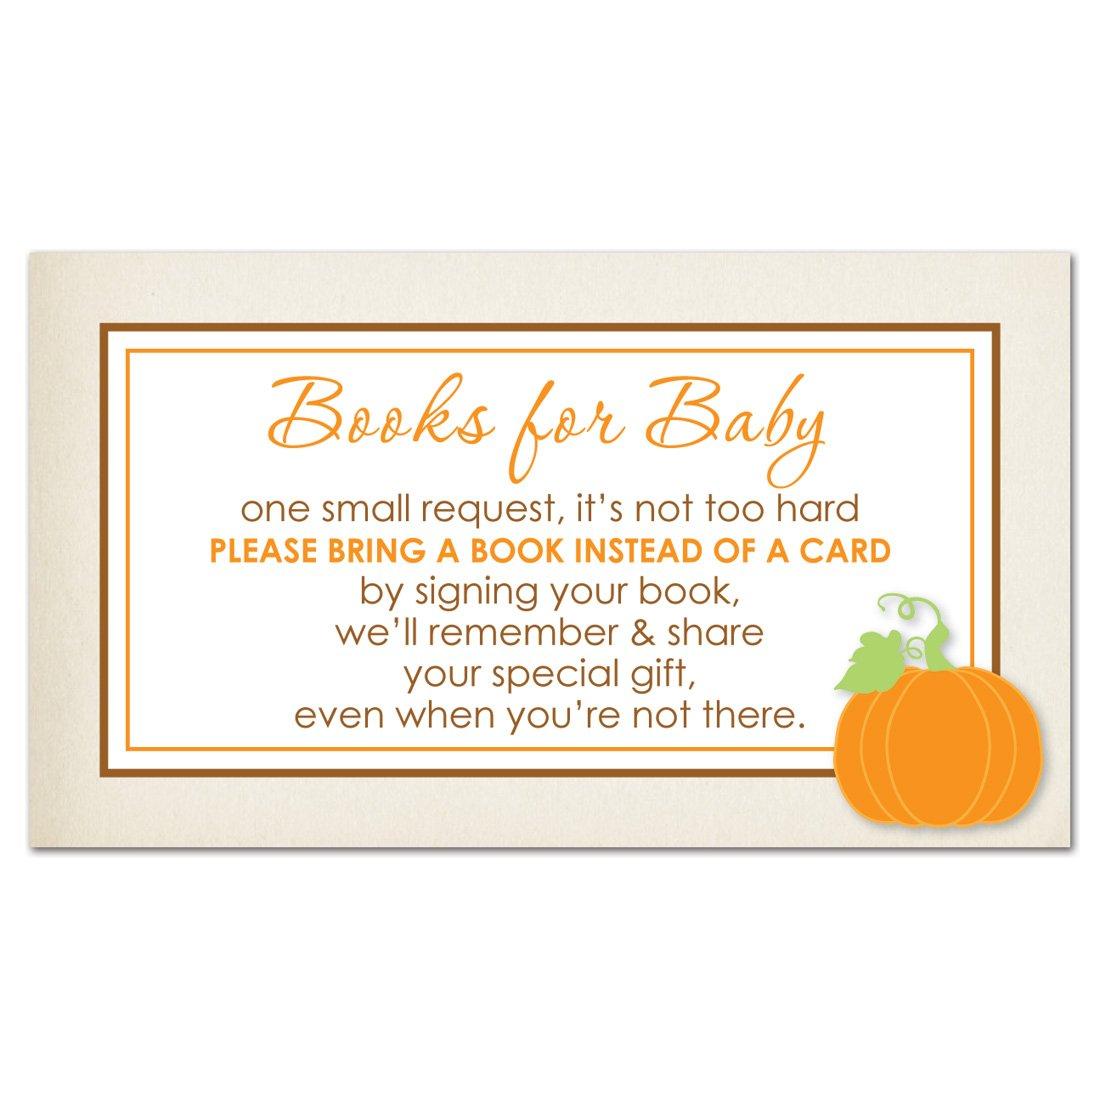 MyExpression.com 48 Little Pumpkin Rustic Border Bring A Book Card